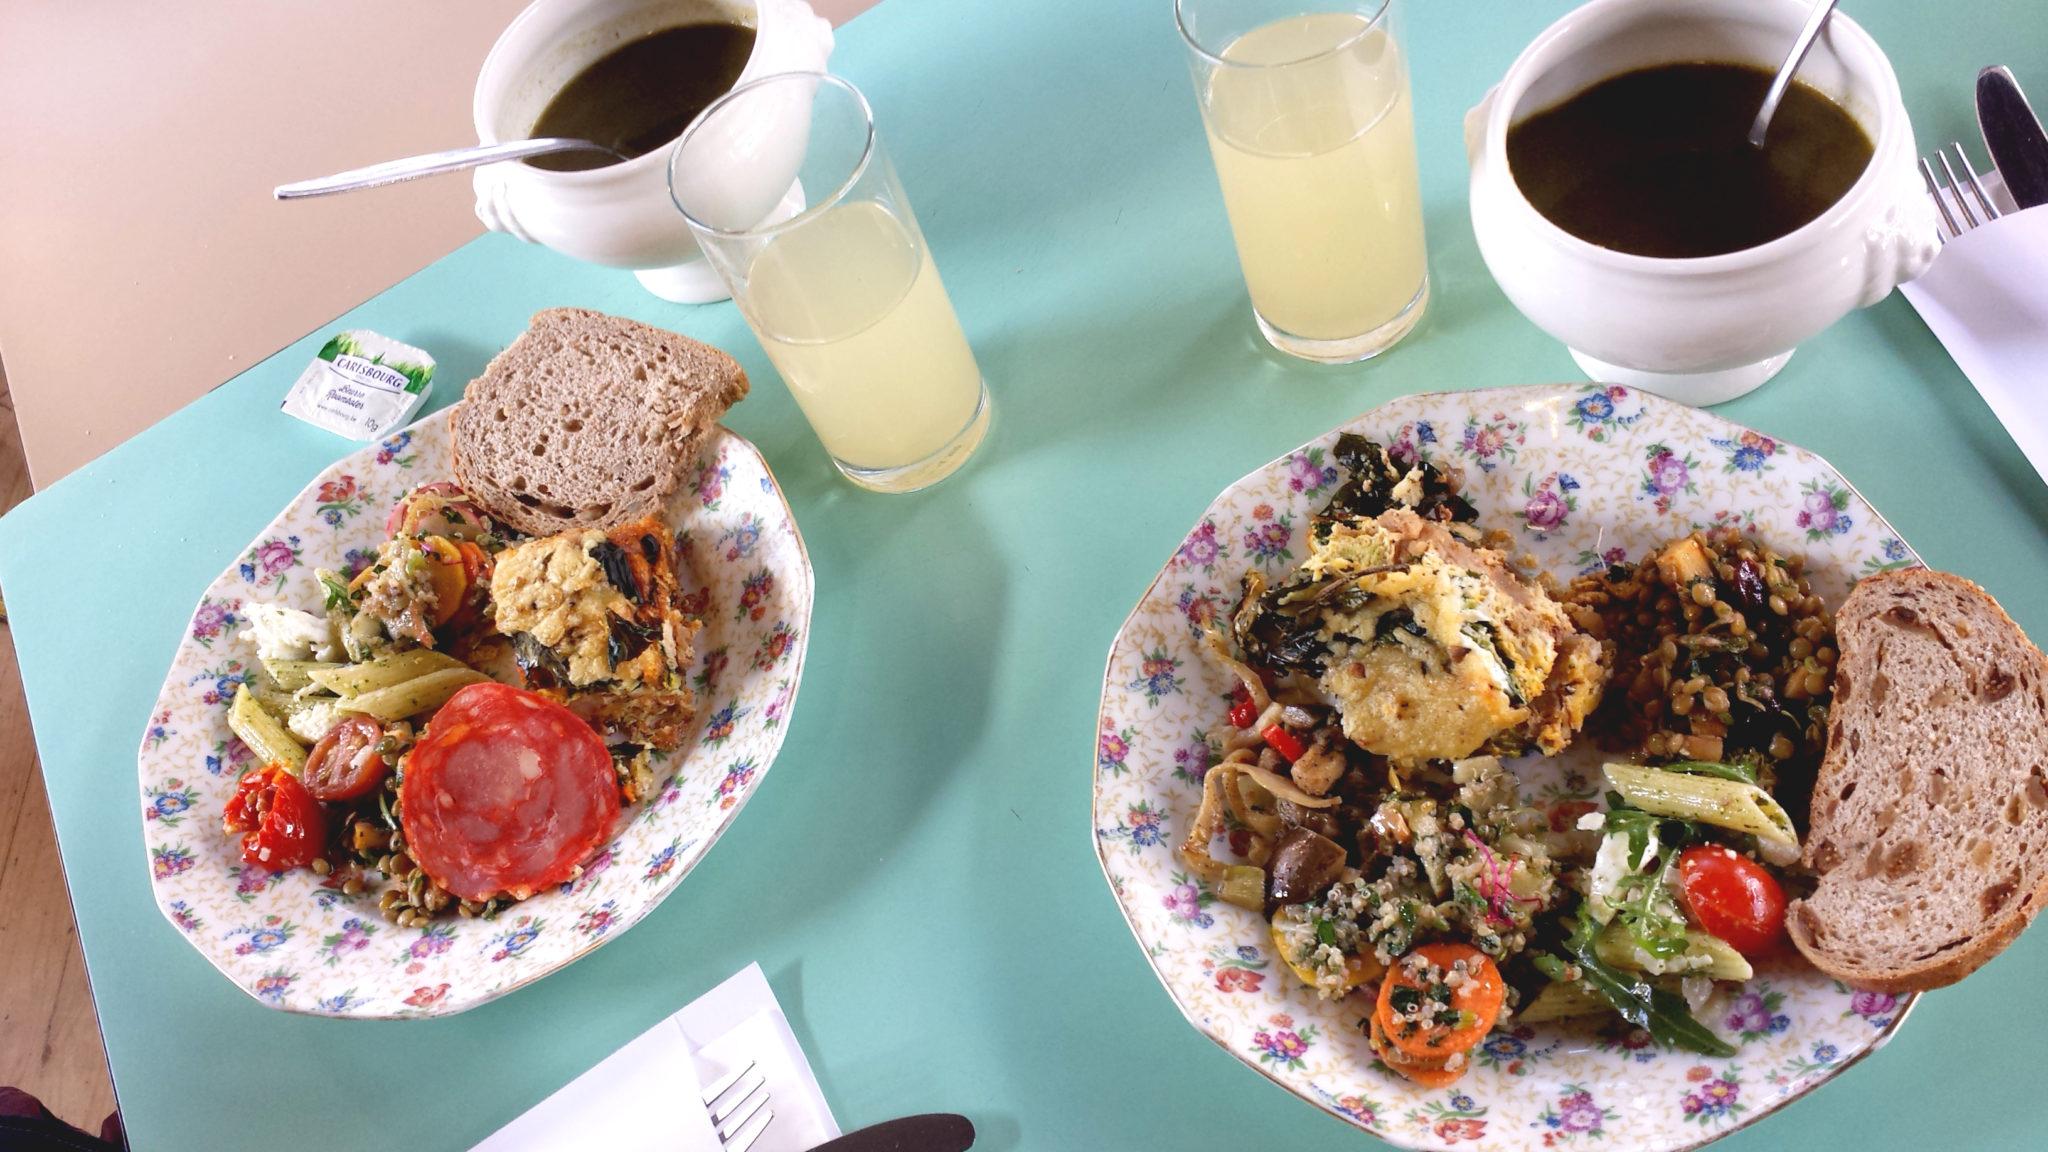 Hema_pose_ses_valises_anvers_localstore_restaurant_repas_green